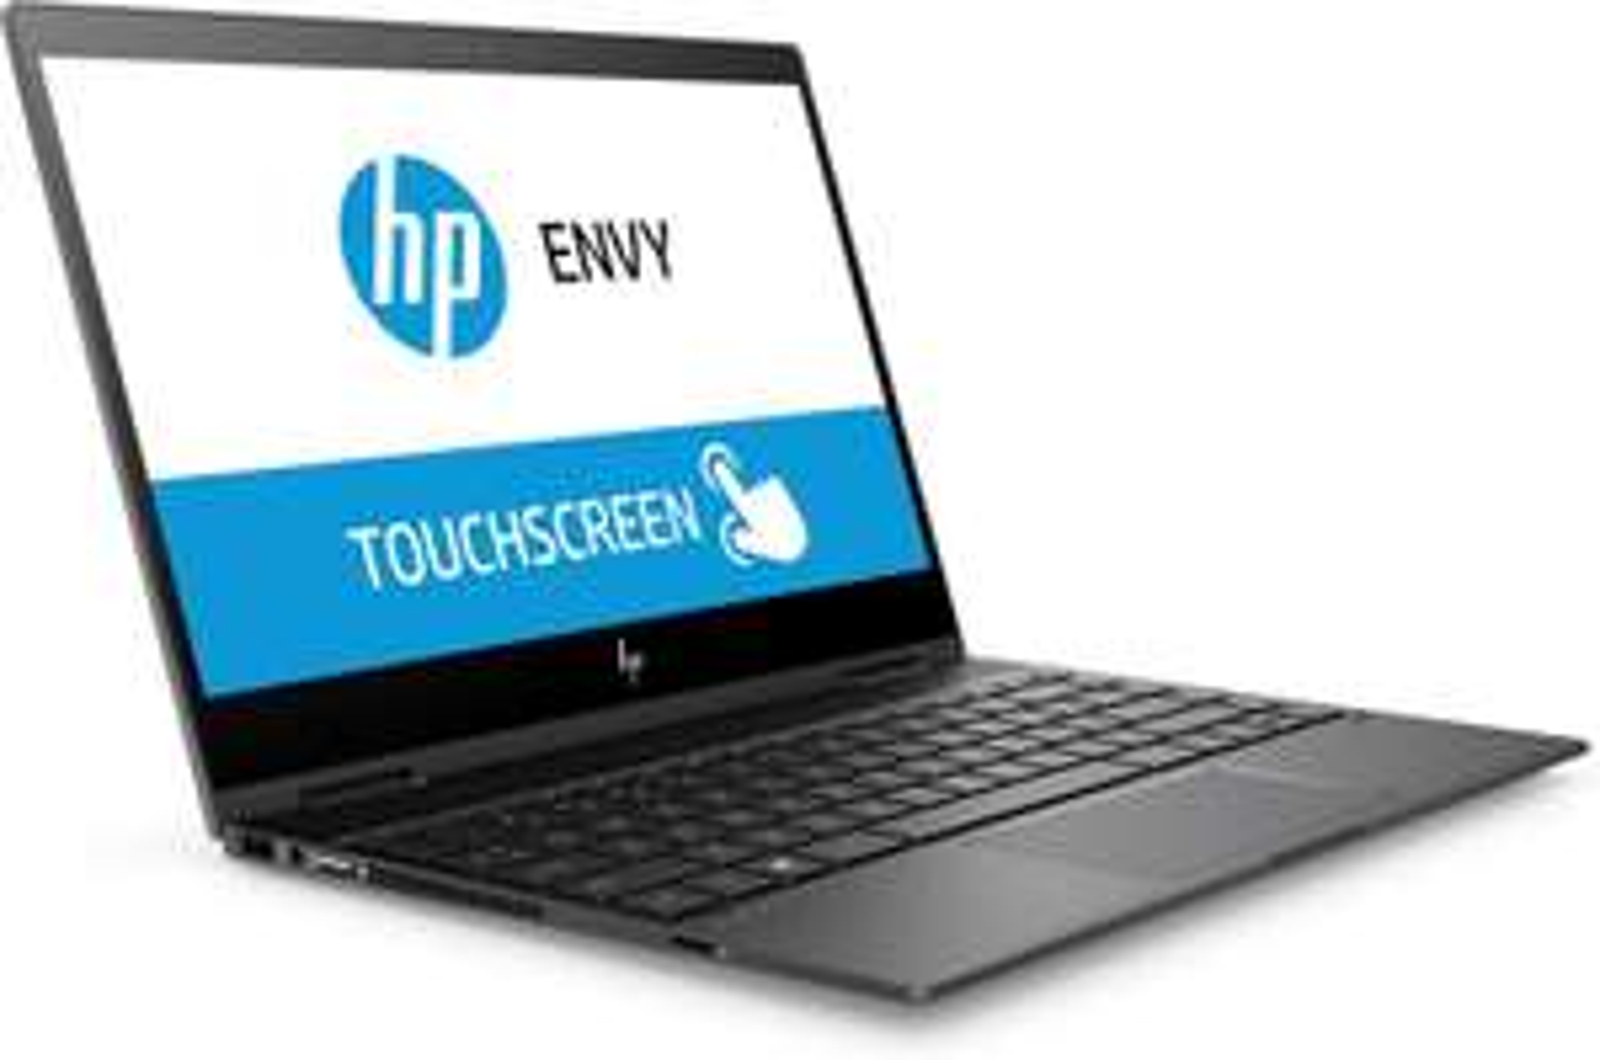 HP Envy x360 Ryzen 5, 8gb, 128gb REFURBISHED Laptop 1yr HP warranty £538.52 at ebay / xsonly (account specific)